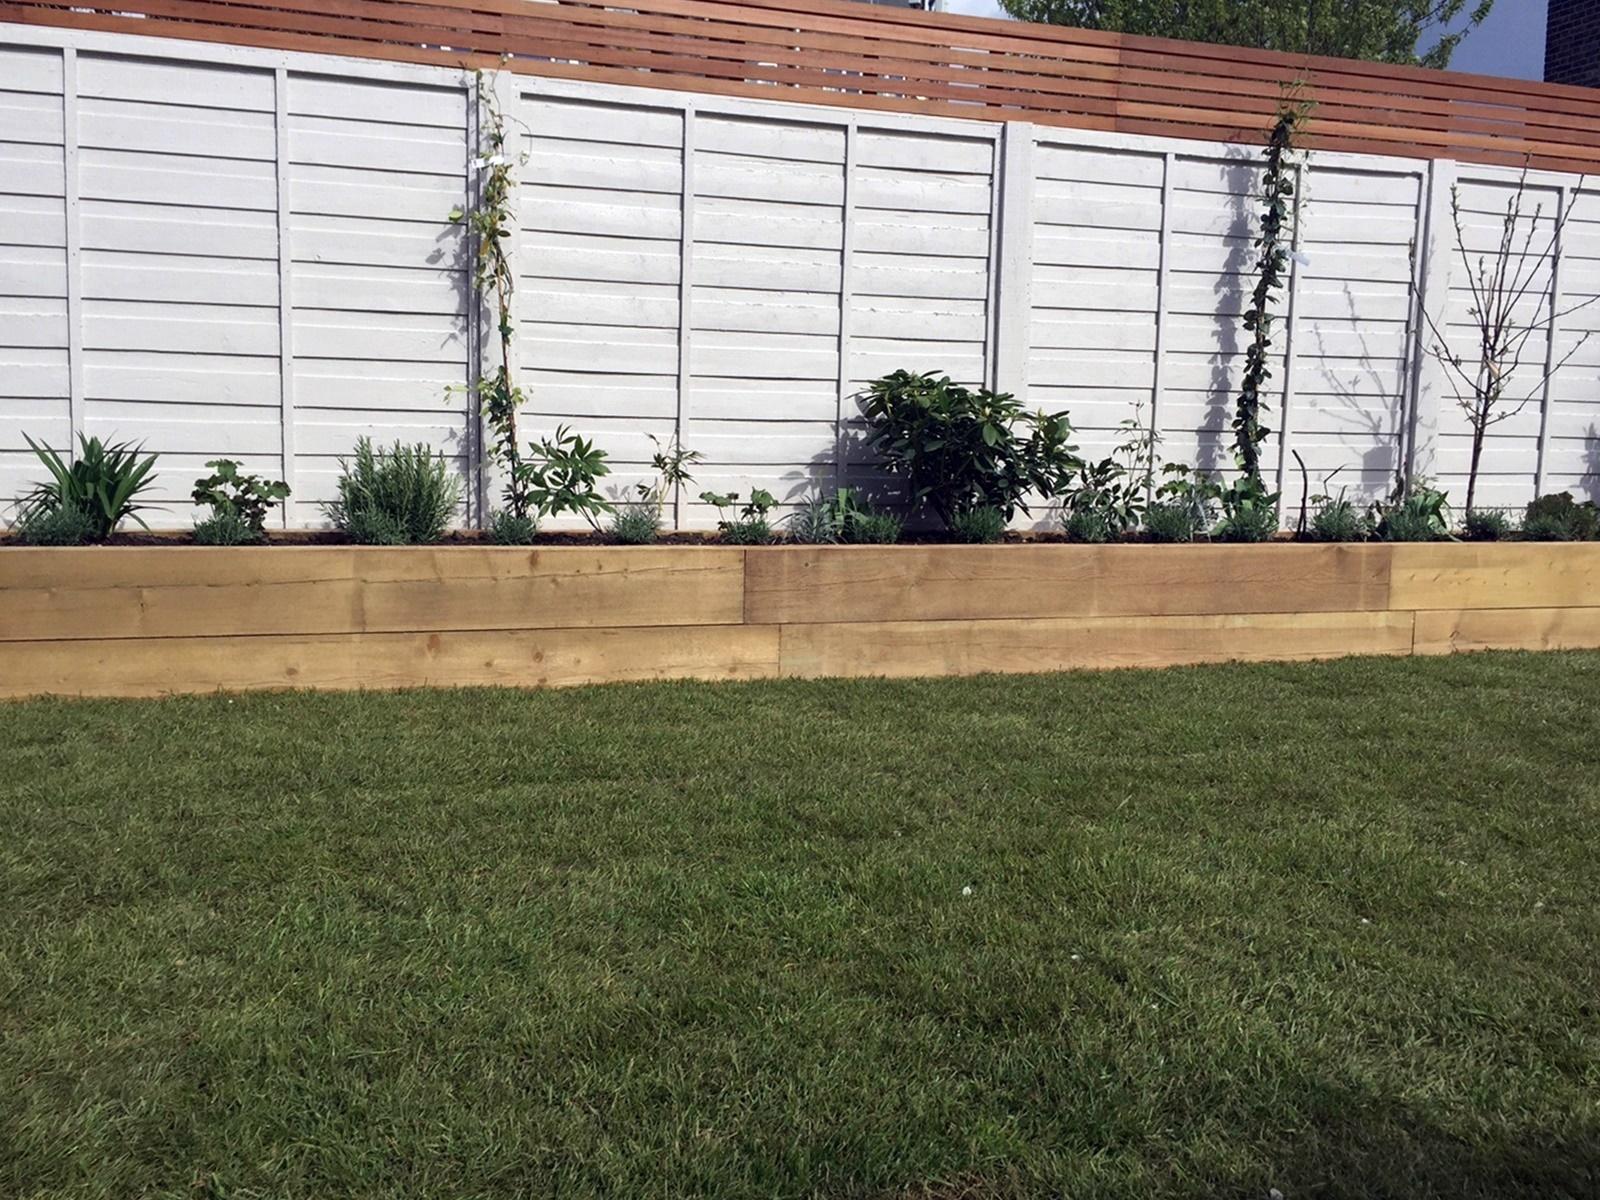 Travertine paving pastel shade painted fence hardwood screen Dulwich London Clapham Balham